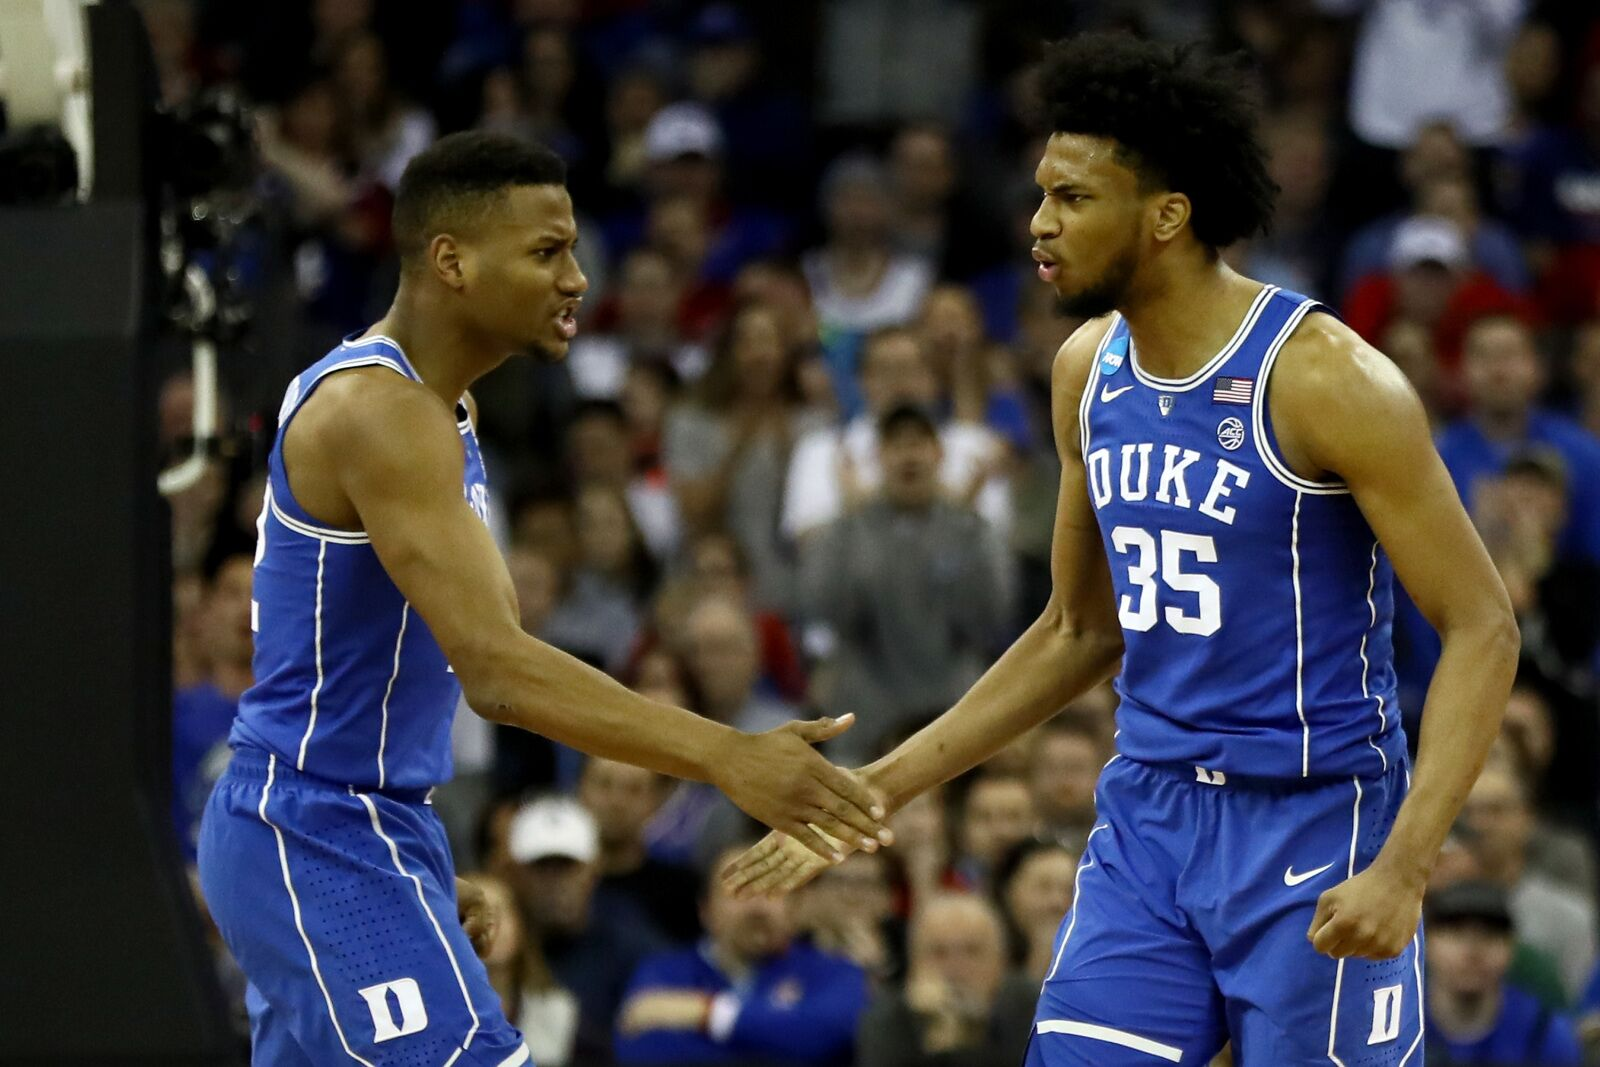 ea06499de Duke Basketball  Predicting captains for the 2018-19 season